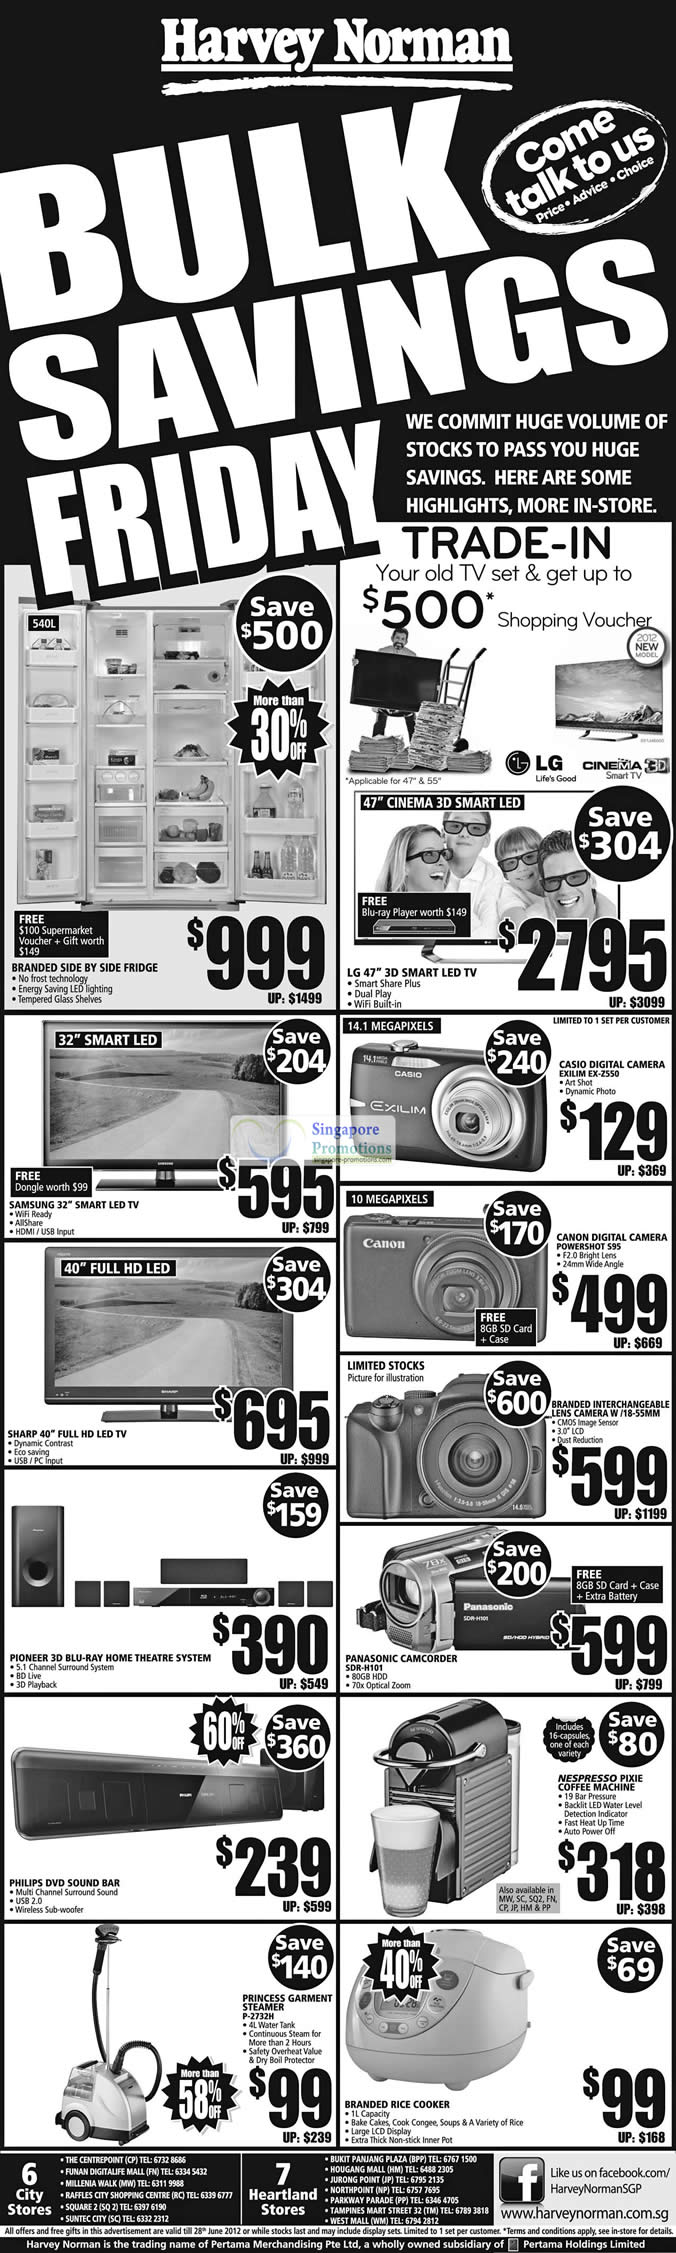 PRINCESS GARMENT STEAMER P-2732H, PANASONIC CAMCORDER SDR-H101, CANON Digital Camera POWERSHOT S95, CASIO Digital Camera EXILIM EX-Z550